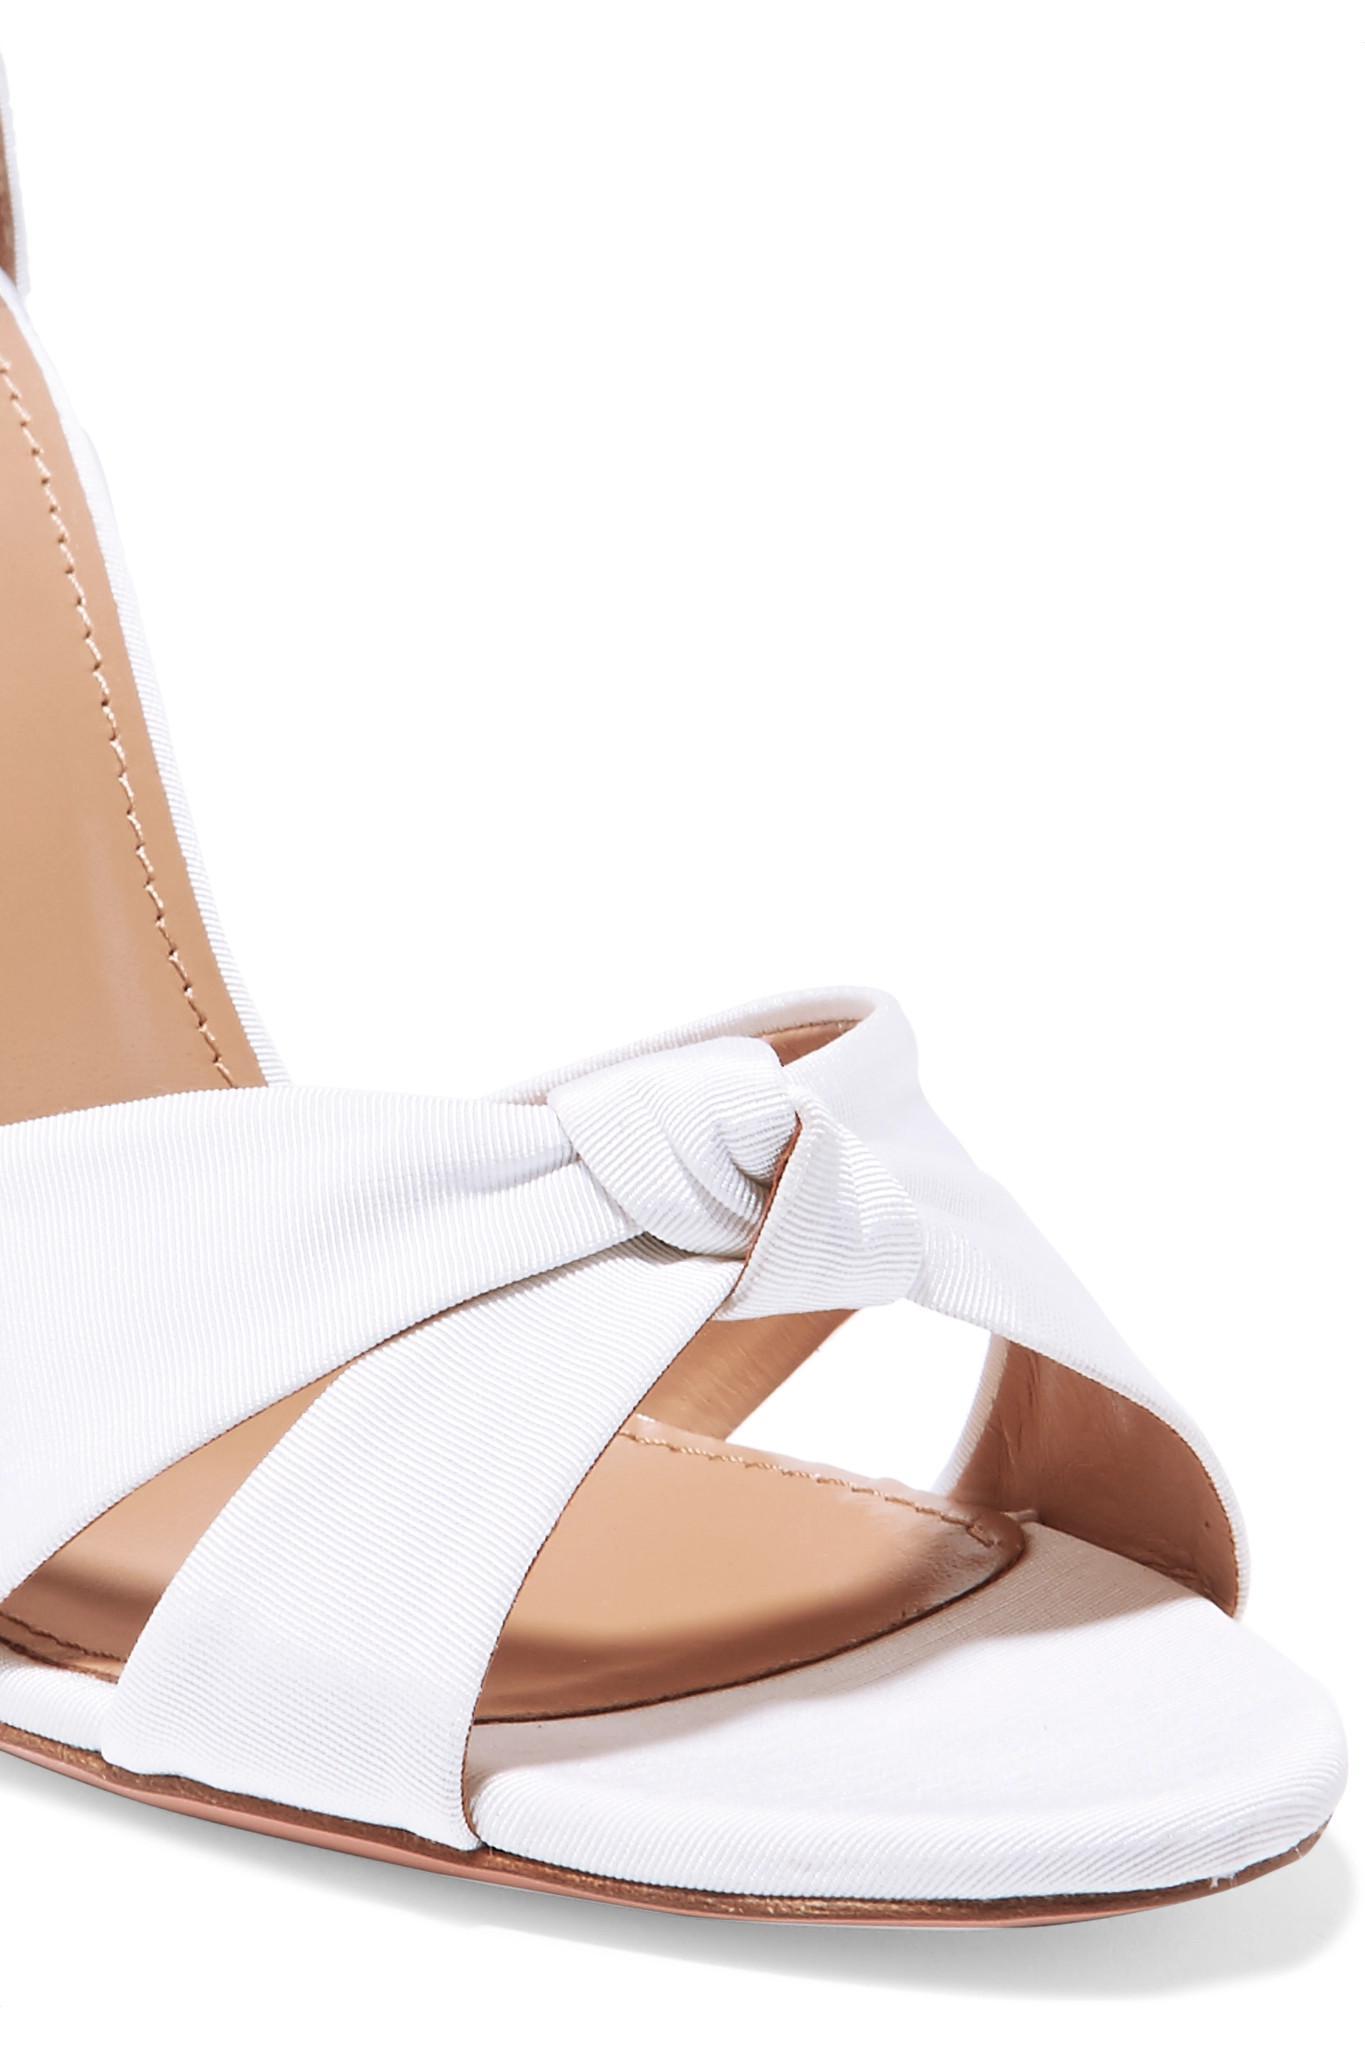 25b80846a76e Lyst - Aquazzura All Tied Up Grosgrain Sandals in White